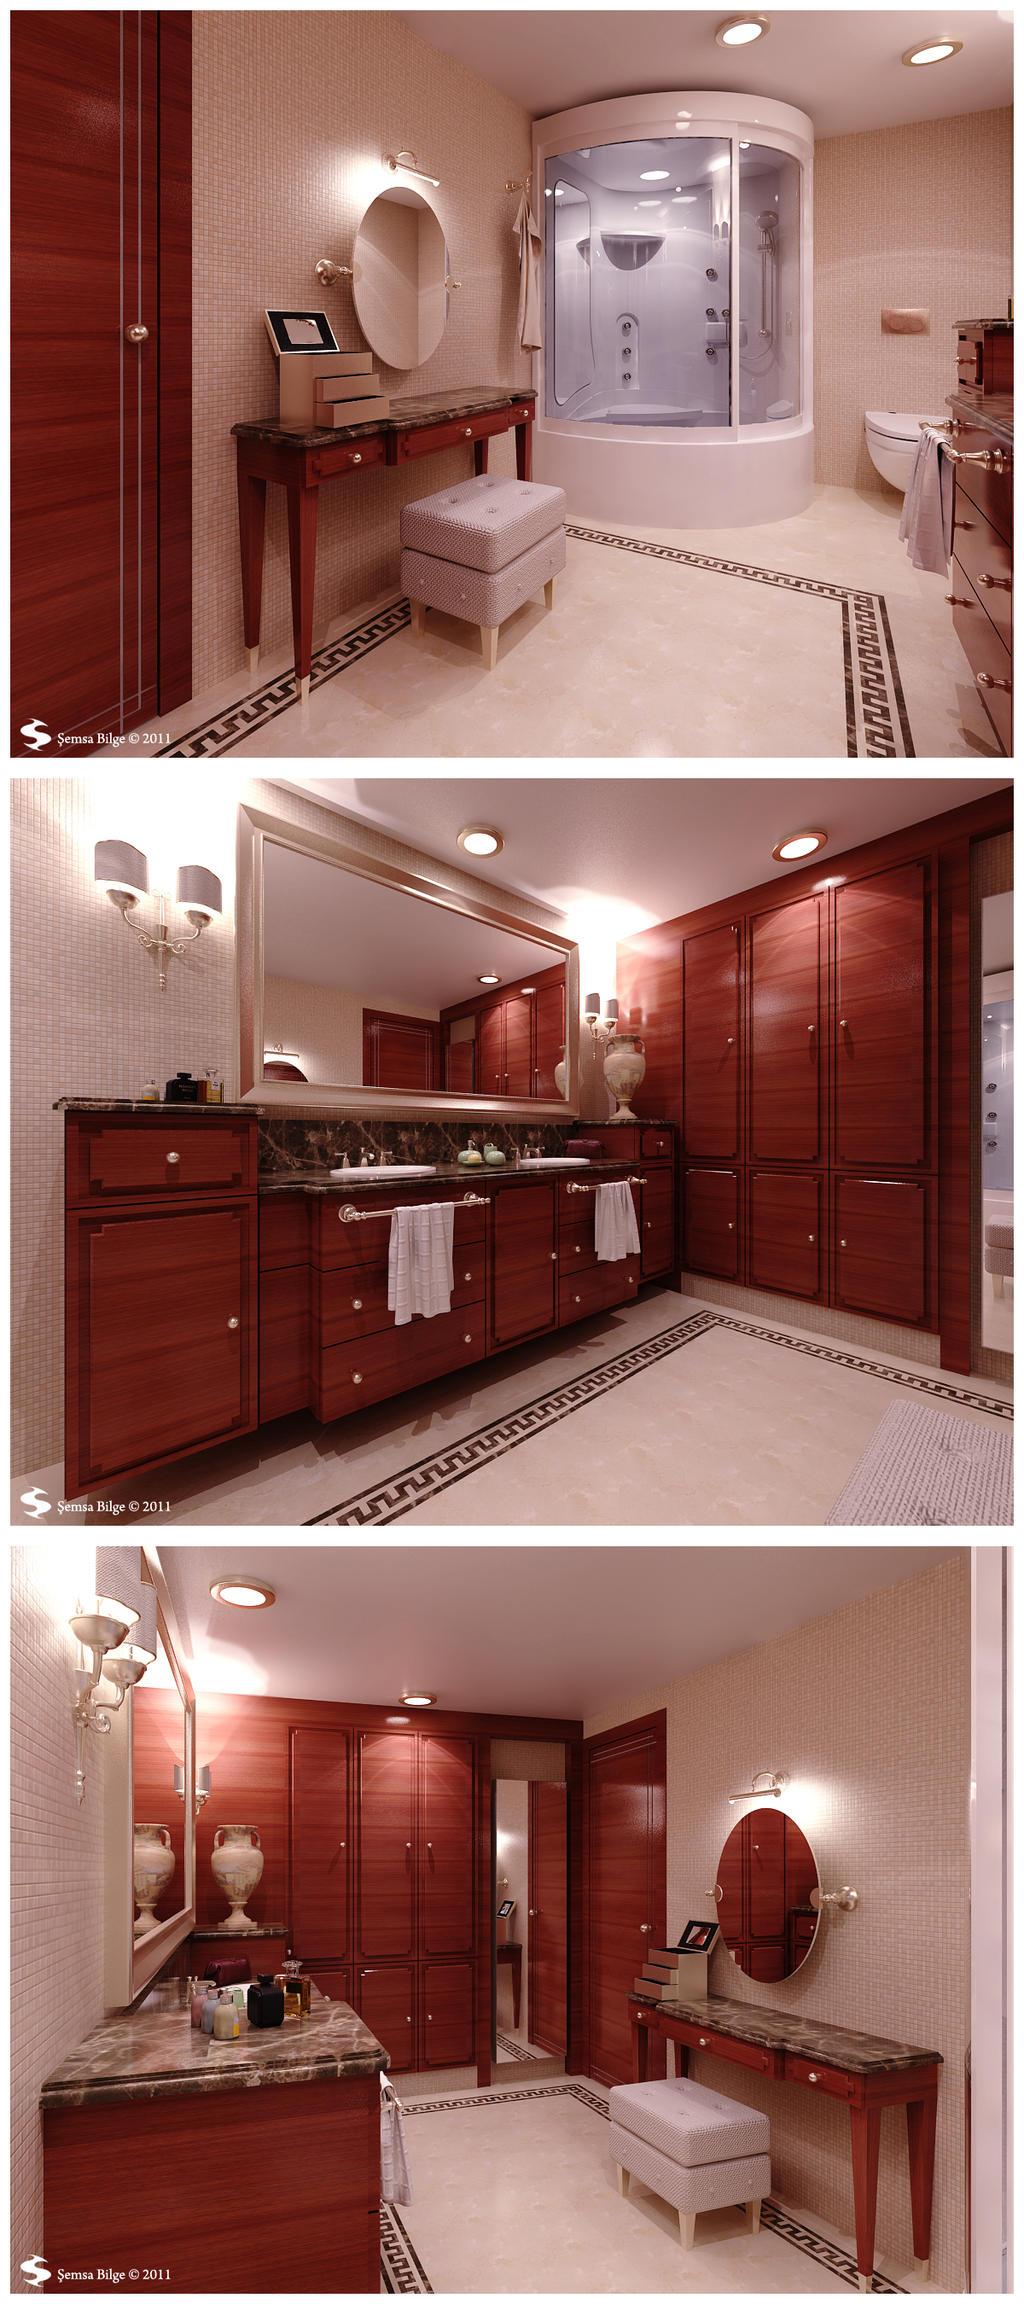 Istanbul H. - Master Bathroom